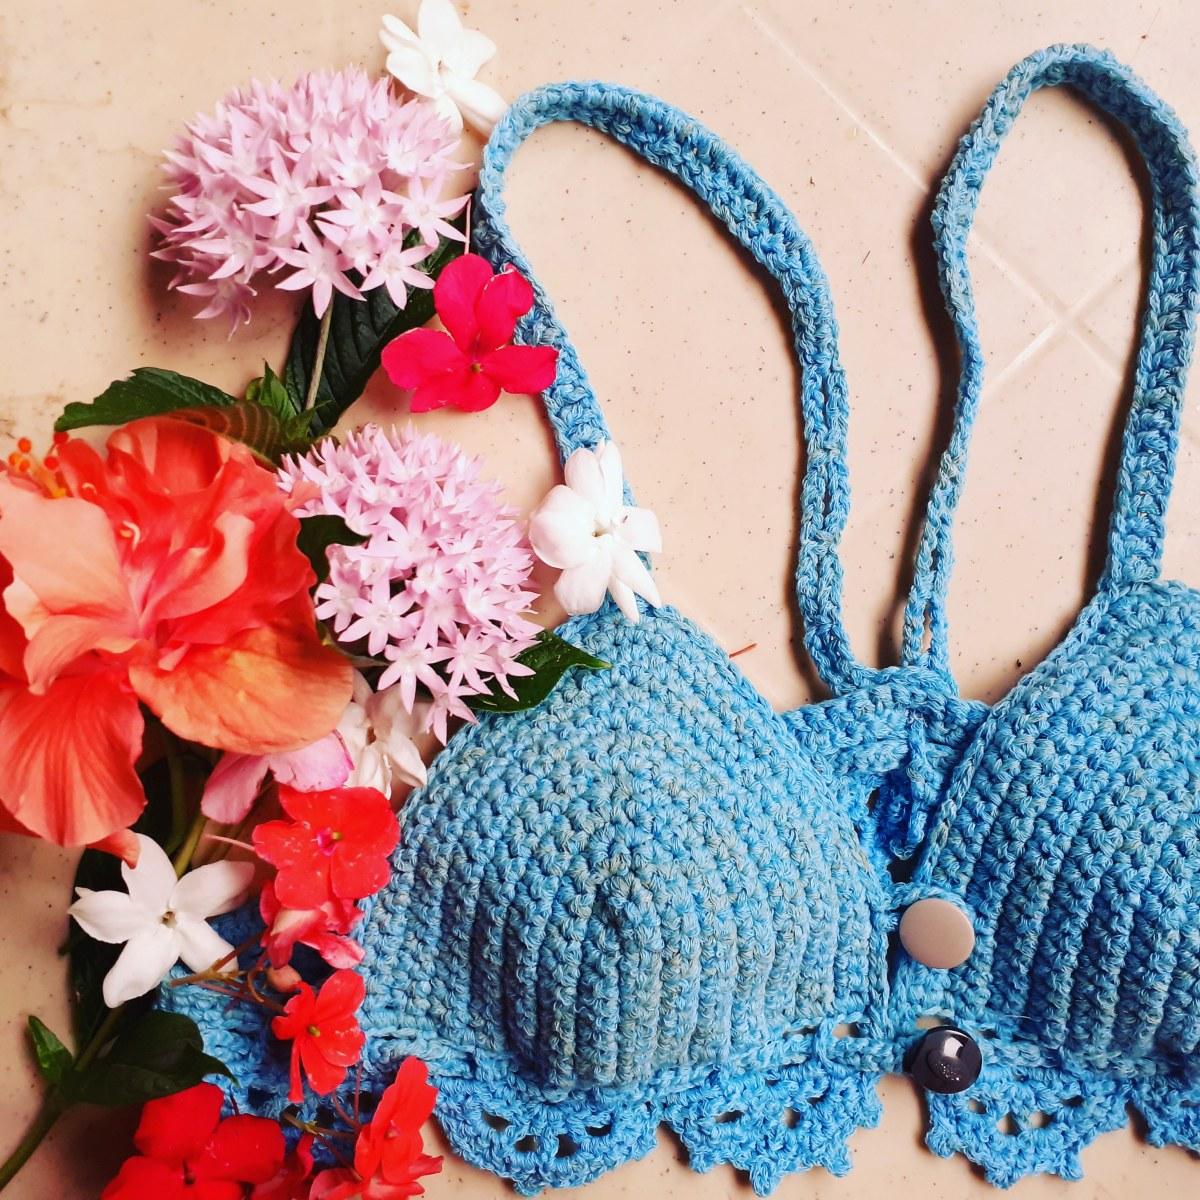 adjustable-front-closure-crochet-bra